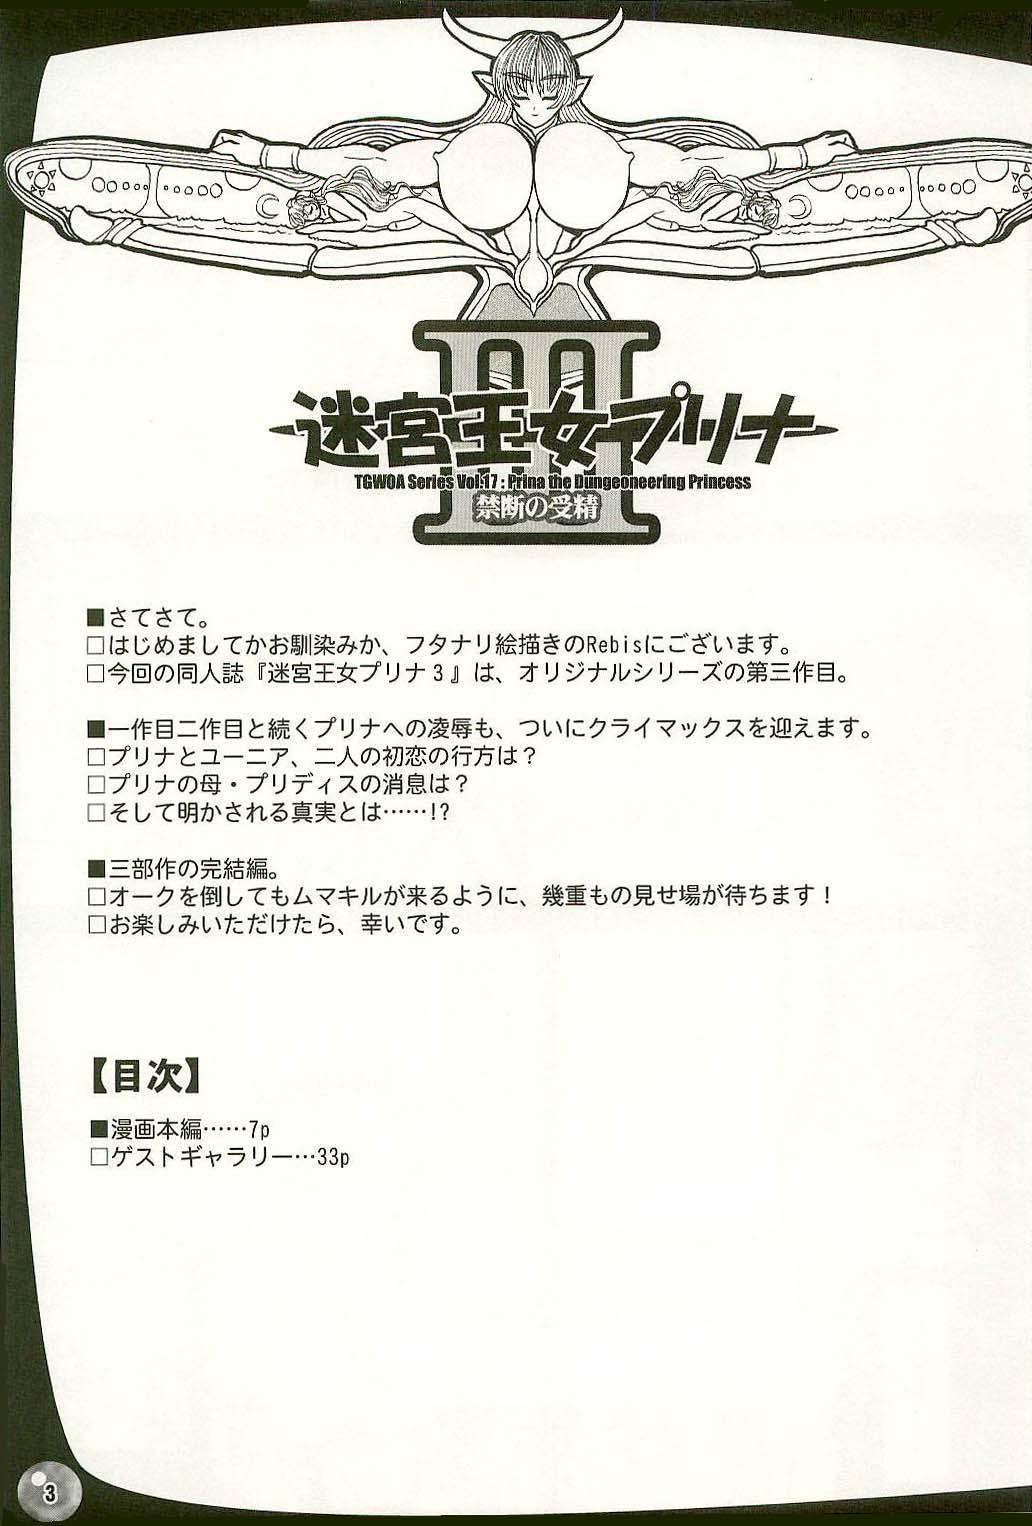 TGWOA Vol.17 - Meikyuu Oujo Prina 3 0